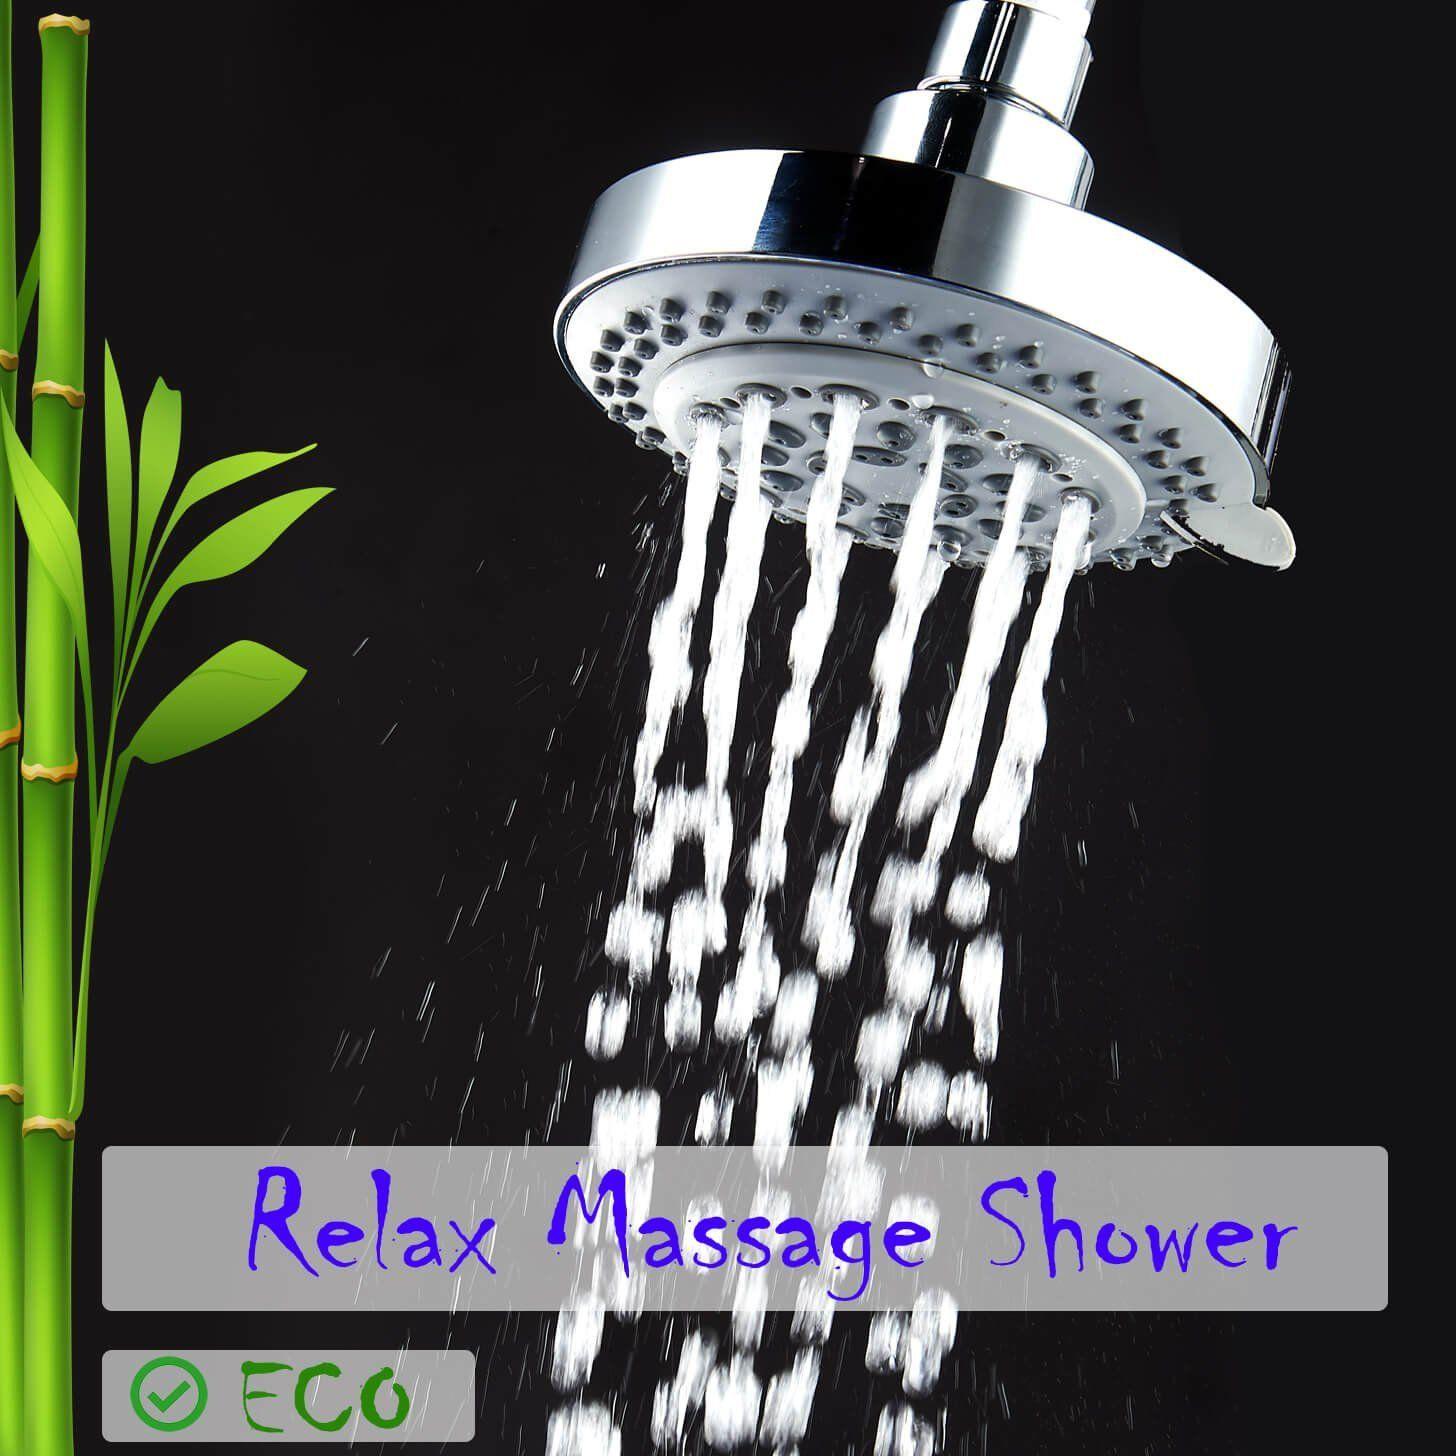 Amazon Com Captaineco 4 Inch 8 Setting High Pressure Shower Head